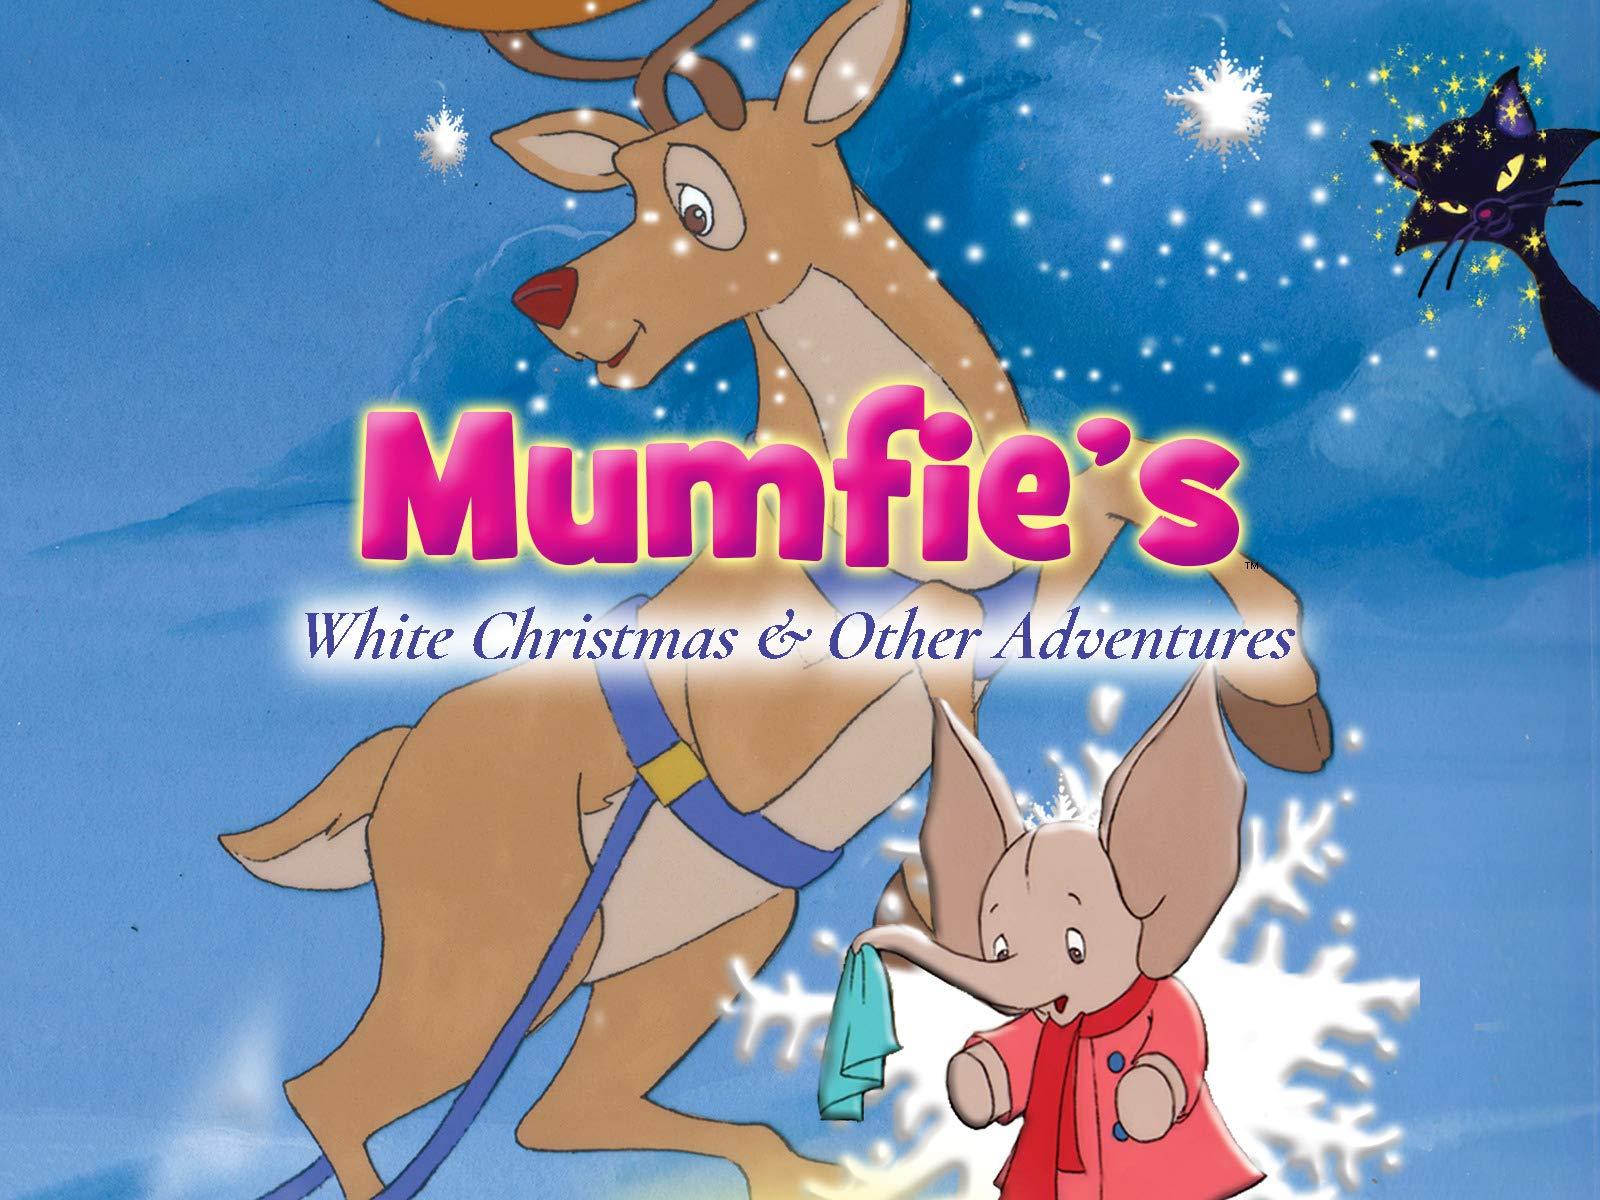 Mumfie's White Christmas & Other Adventures